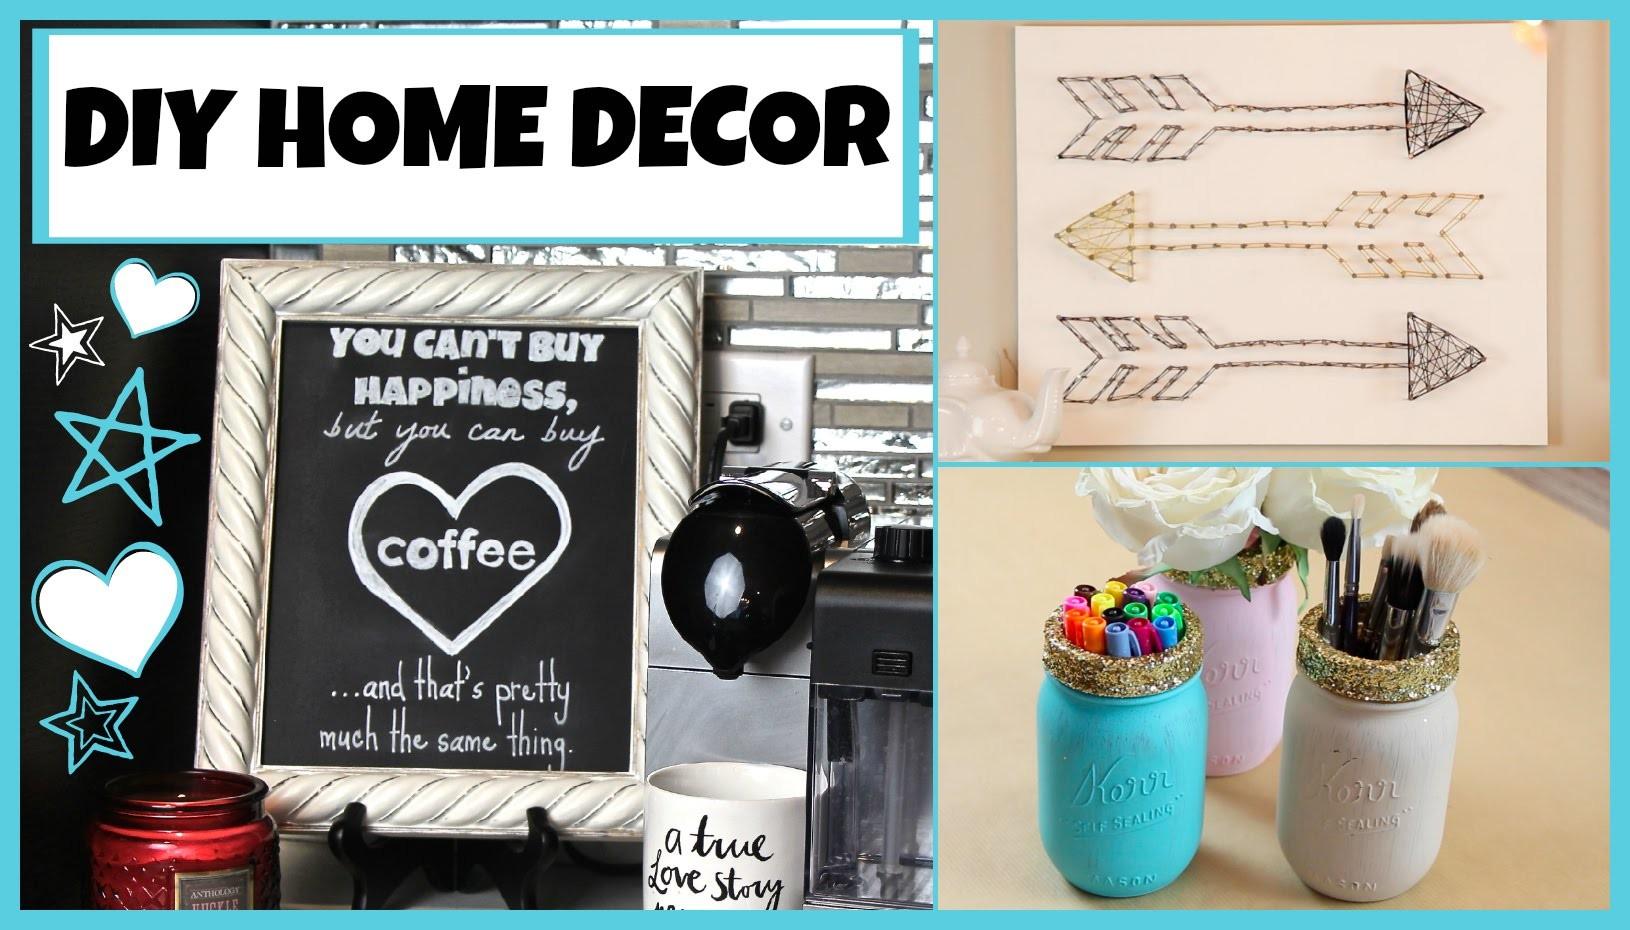 DIY Home Decor! String Art - Mason Jar Organizers & Perfect Chalkboard Lettering!